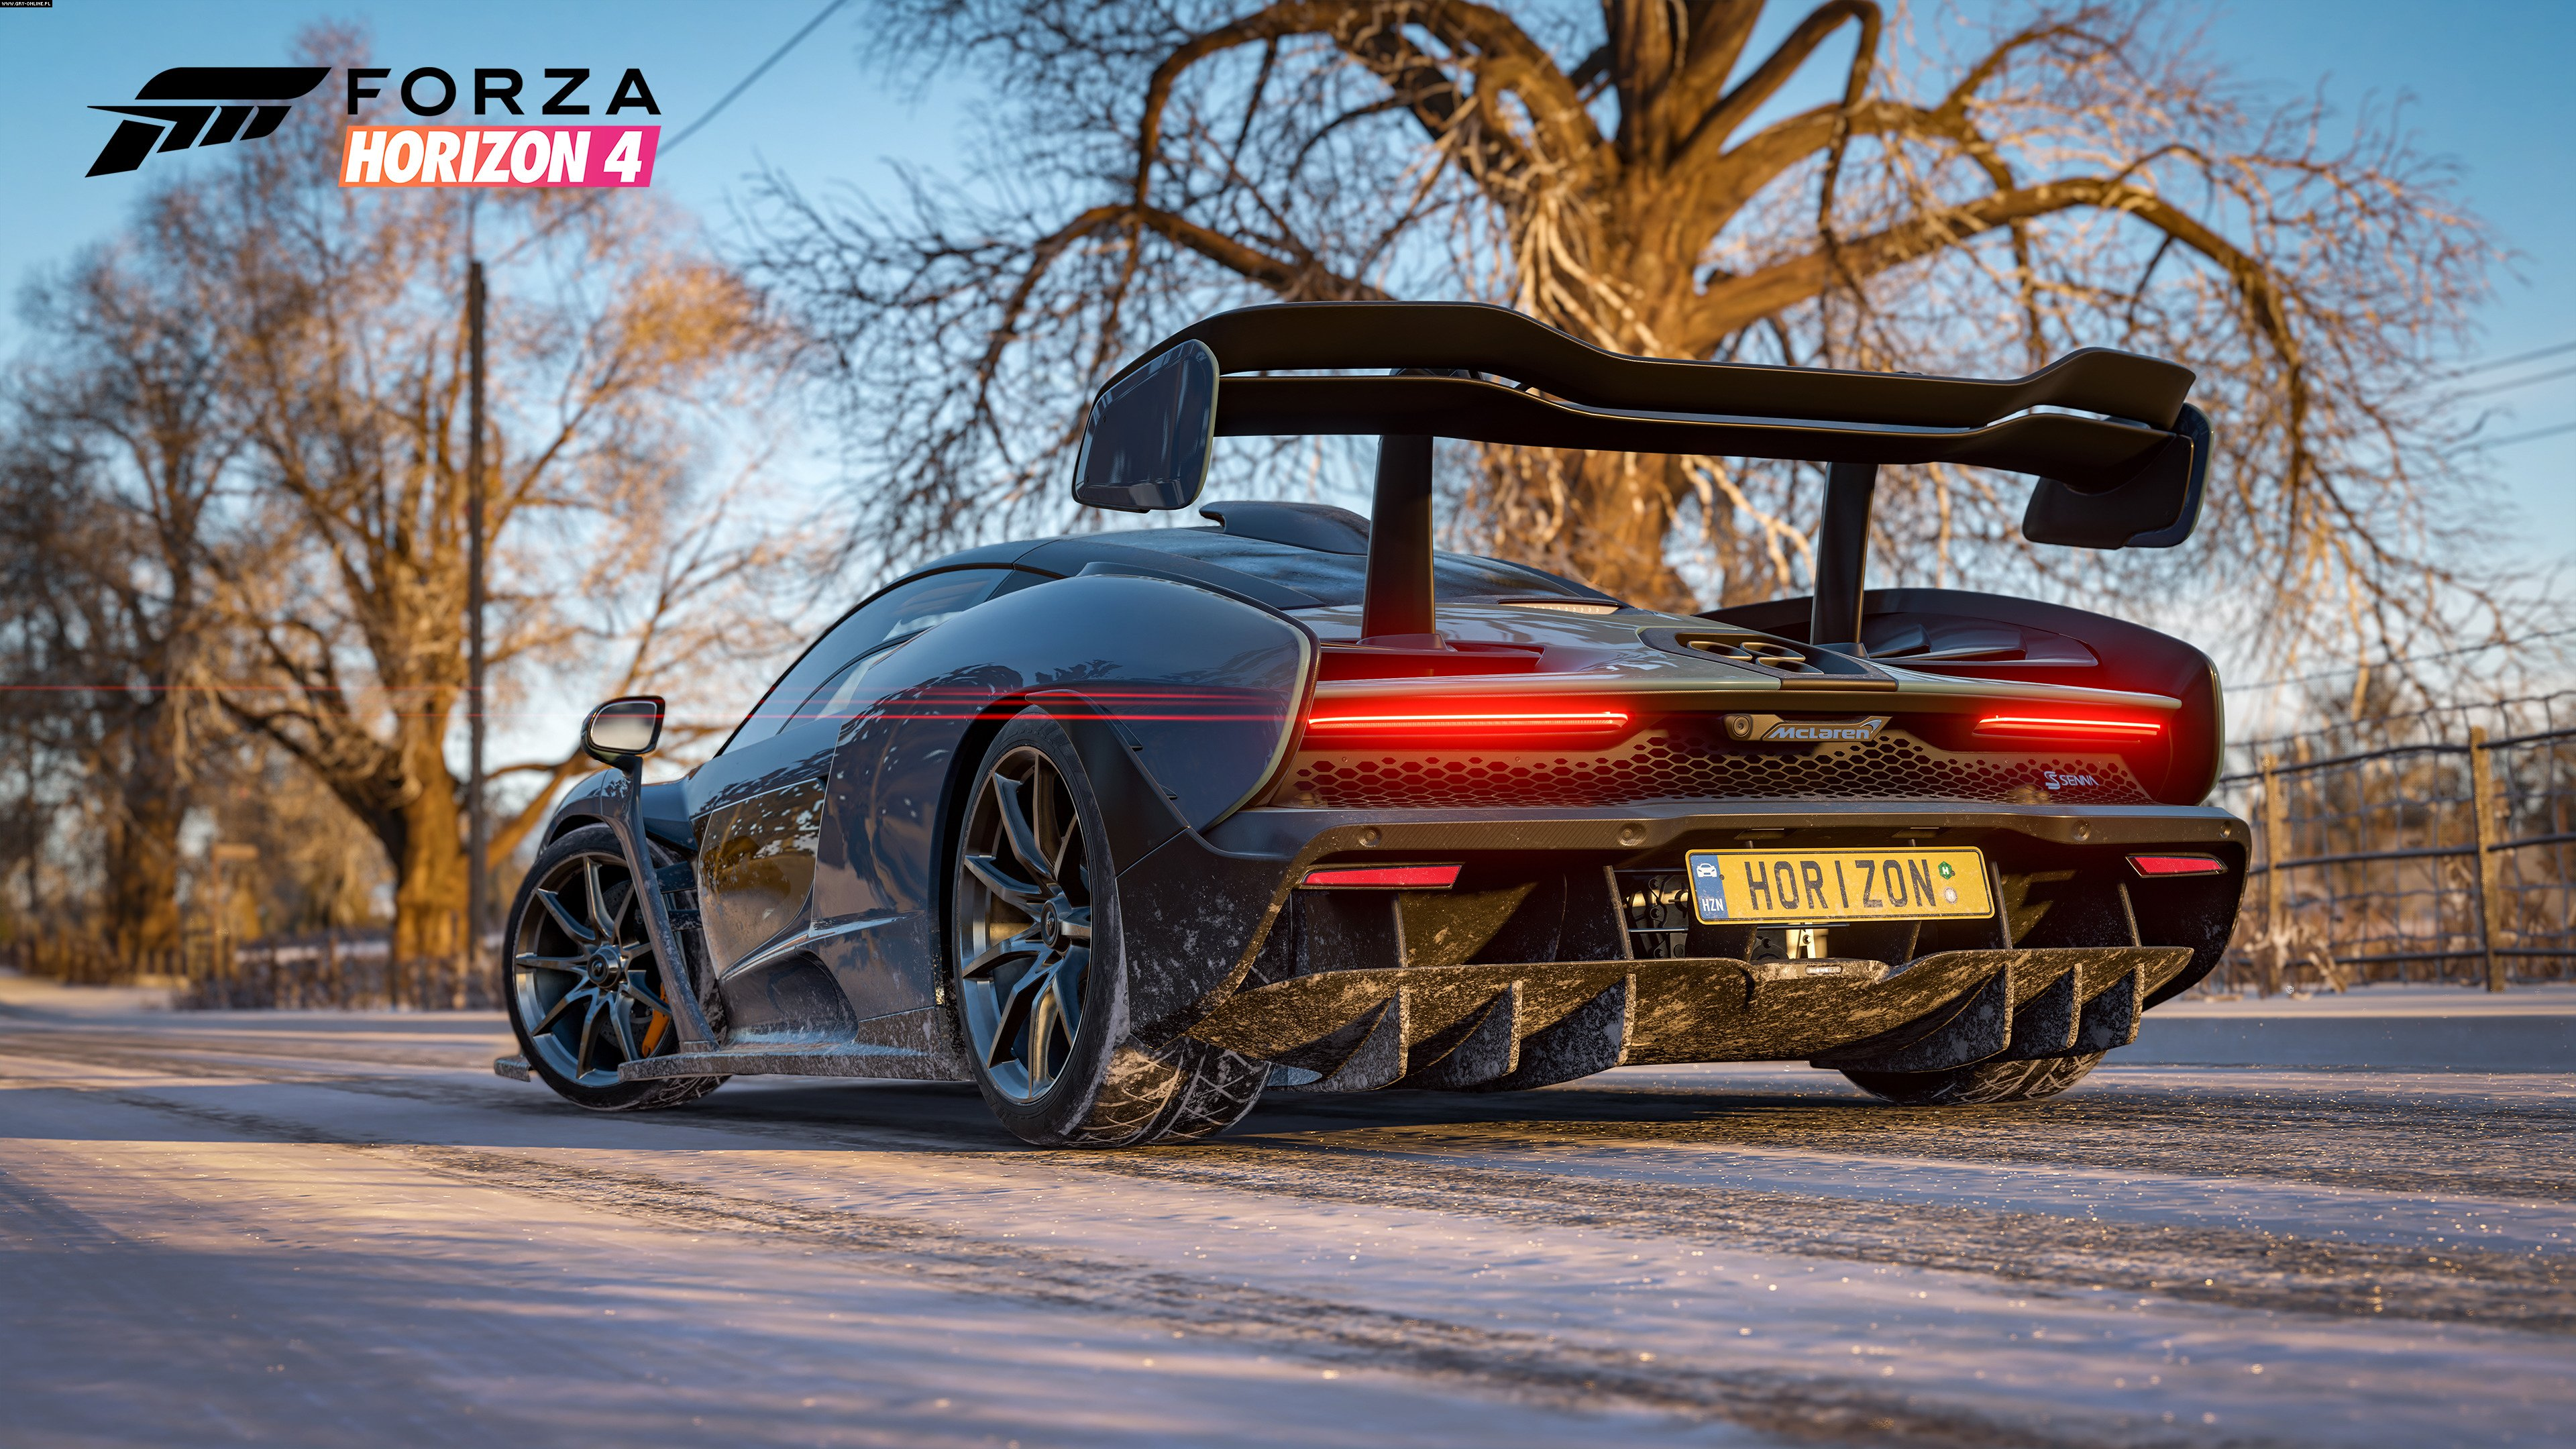 Forza Horizon 4 PC, XONE Games Image 6/14, Playground Games, Microsoft Studios